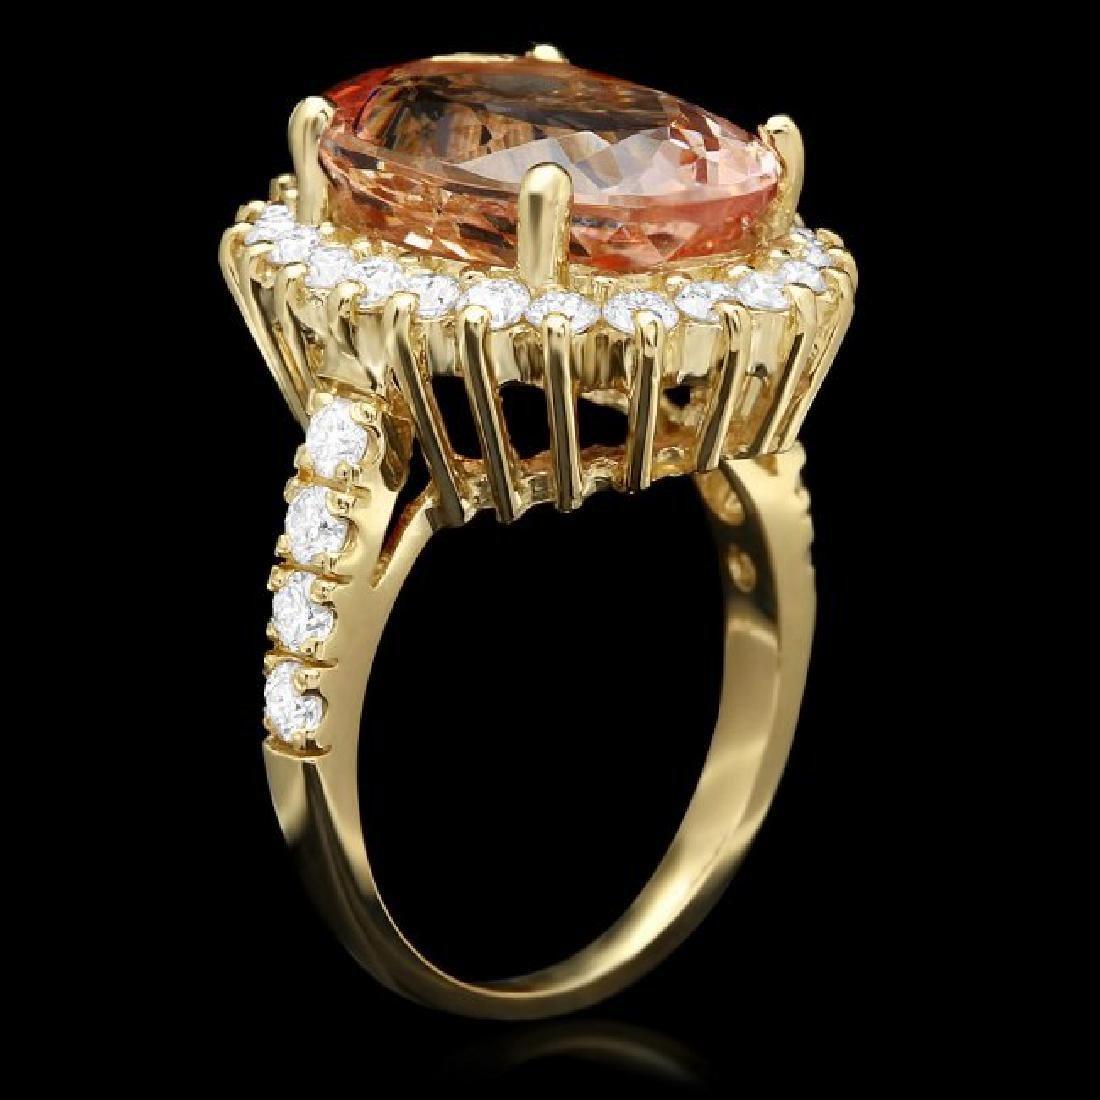 14k Gold 8.00ct Morganite 1.30ct Diamond Ring - 2